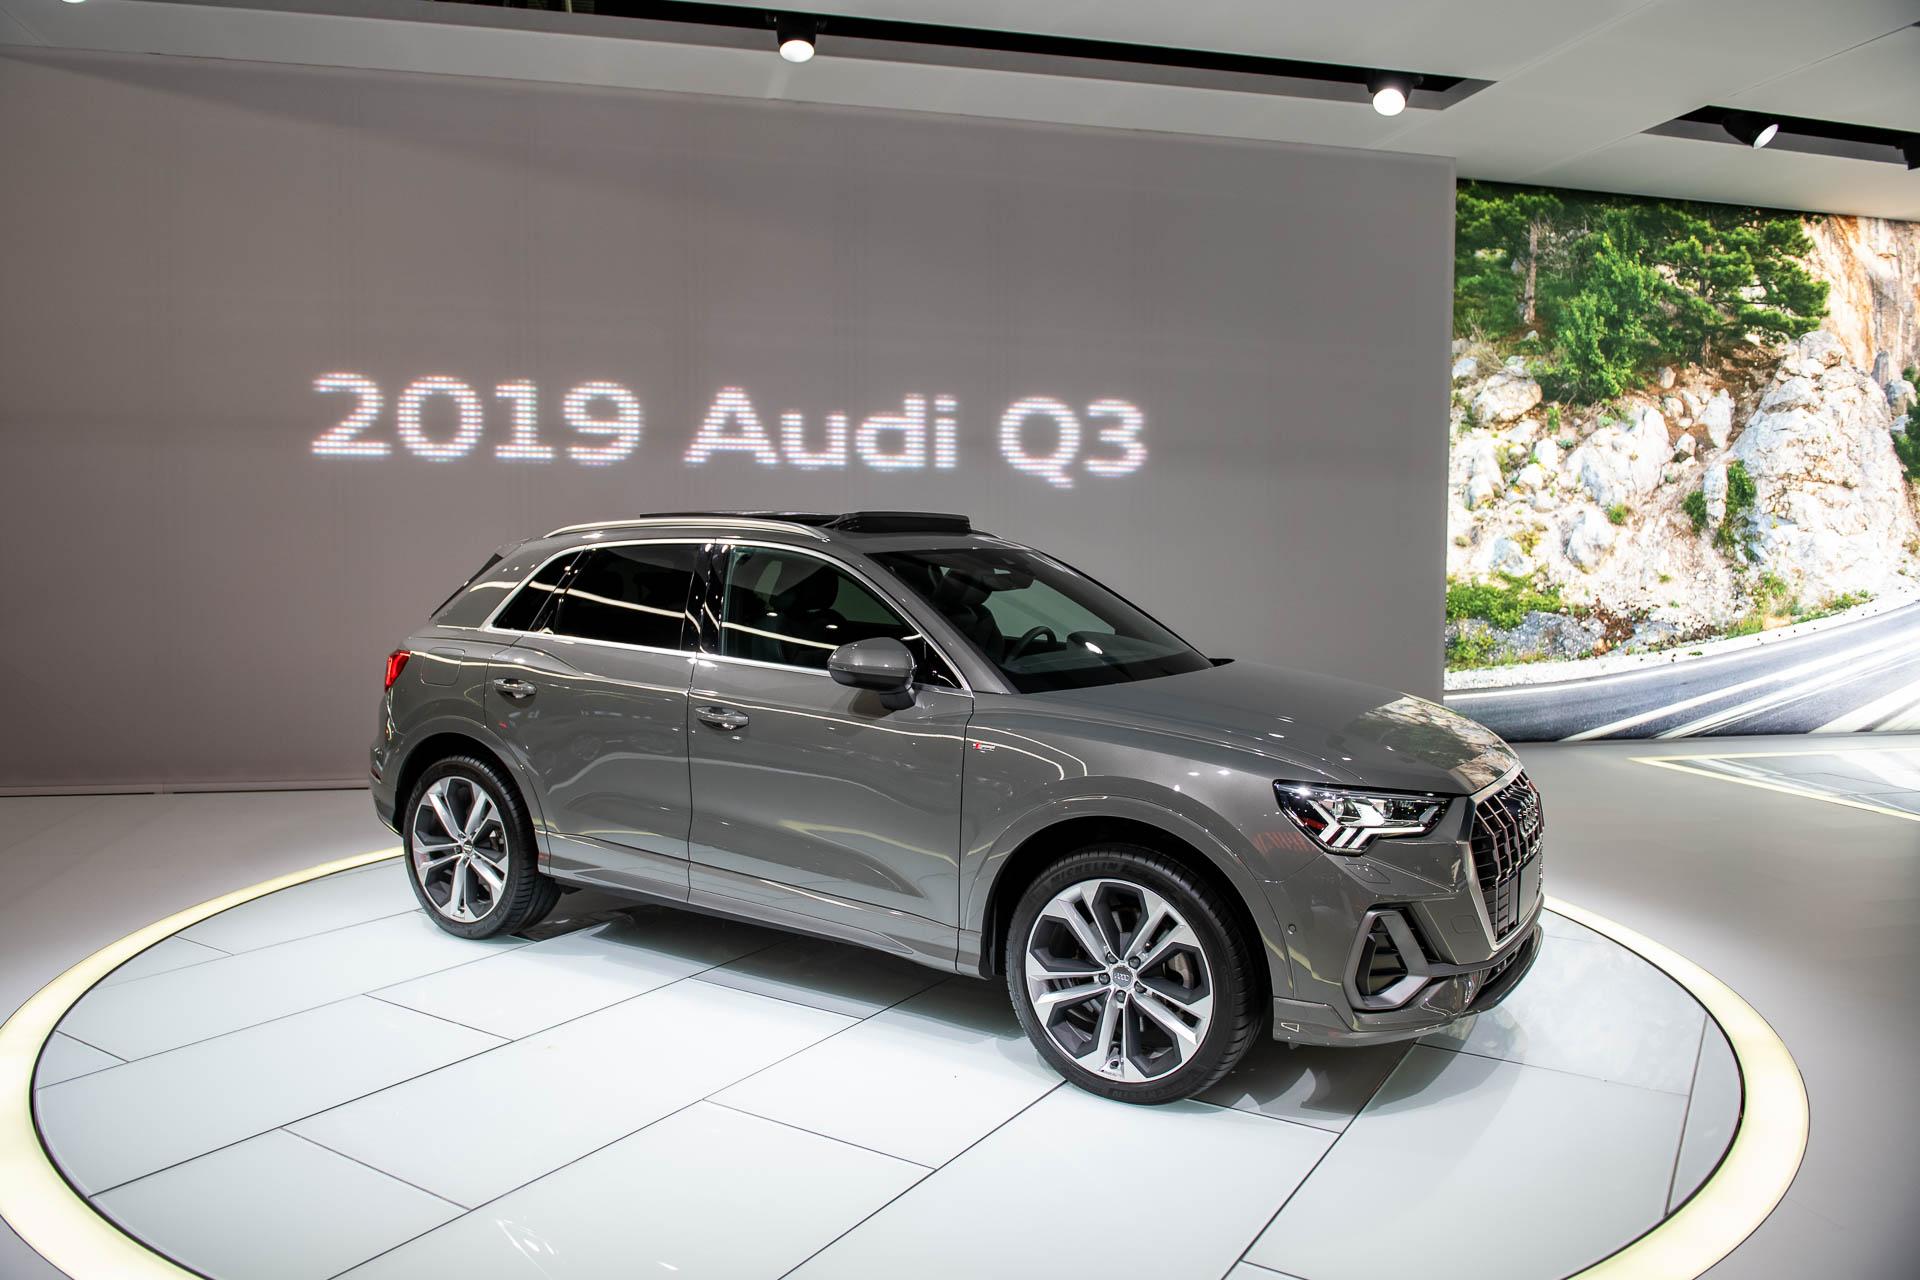 audi q3 owners manual 2019